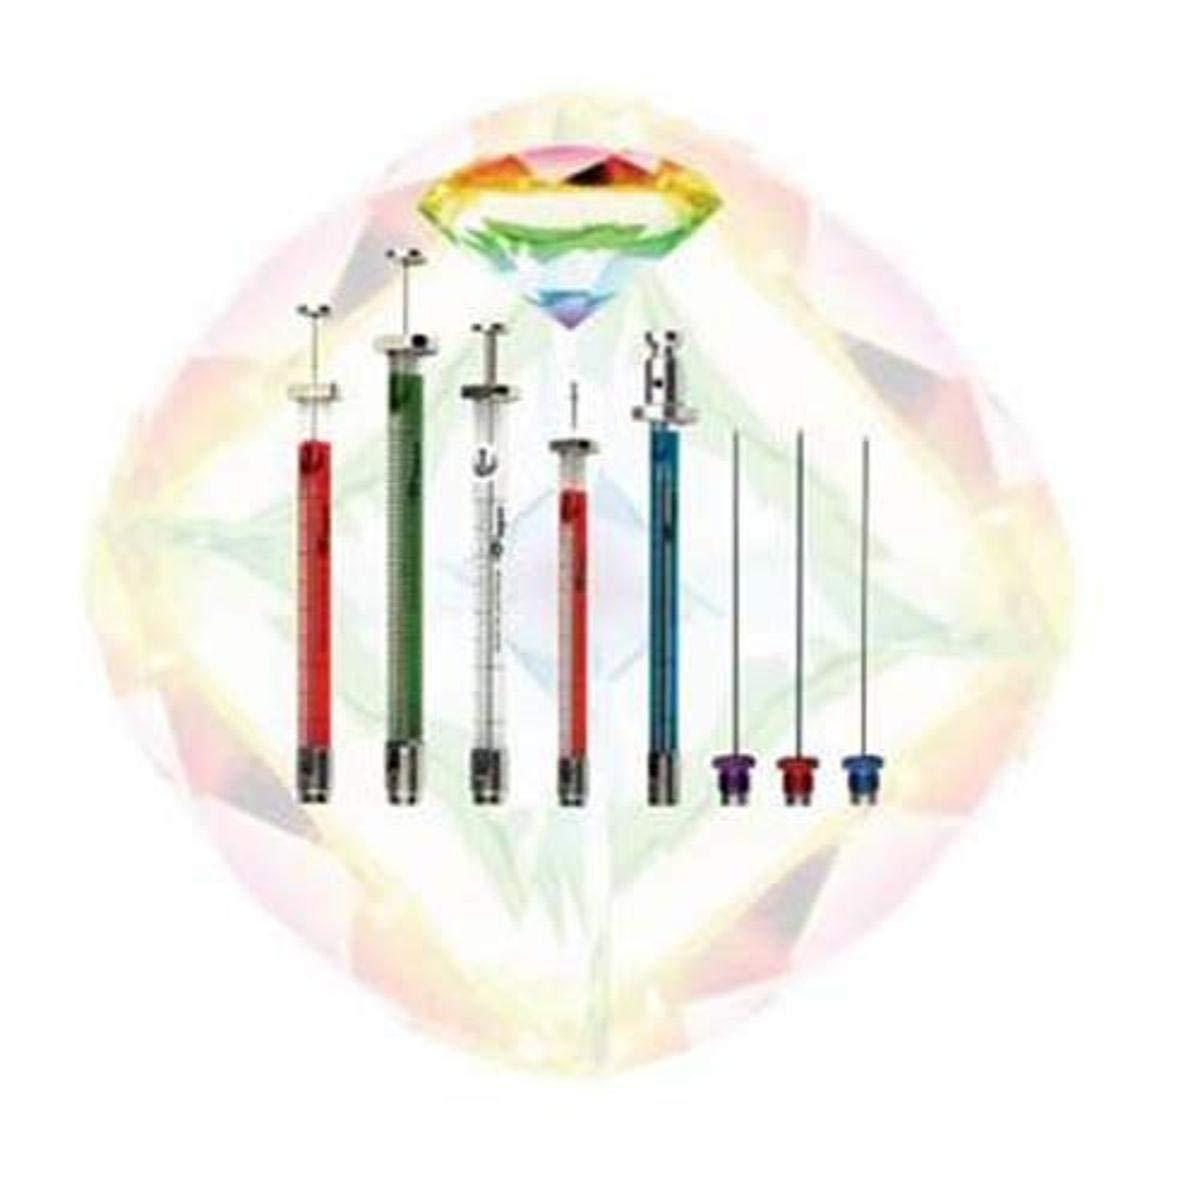 Trajan Manufacturer regenerated product Scientific 004750 Diamond MS Philadelphia Mall 50 Manual Syringe µL